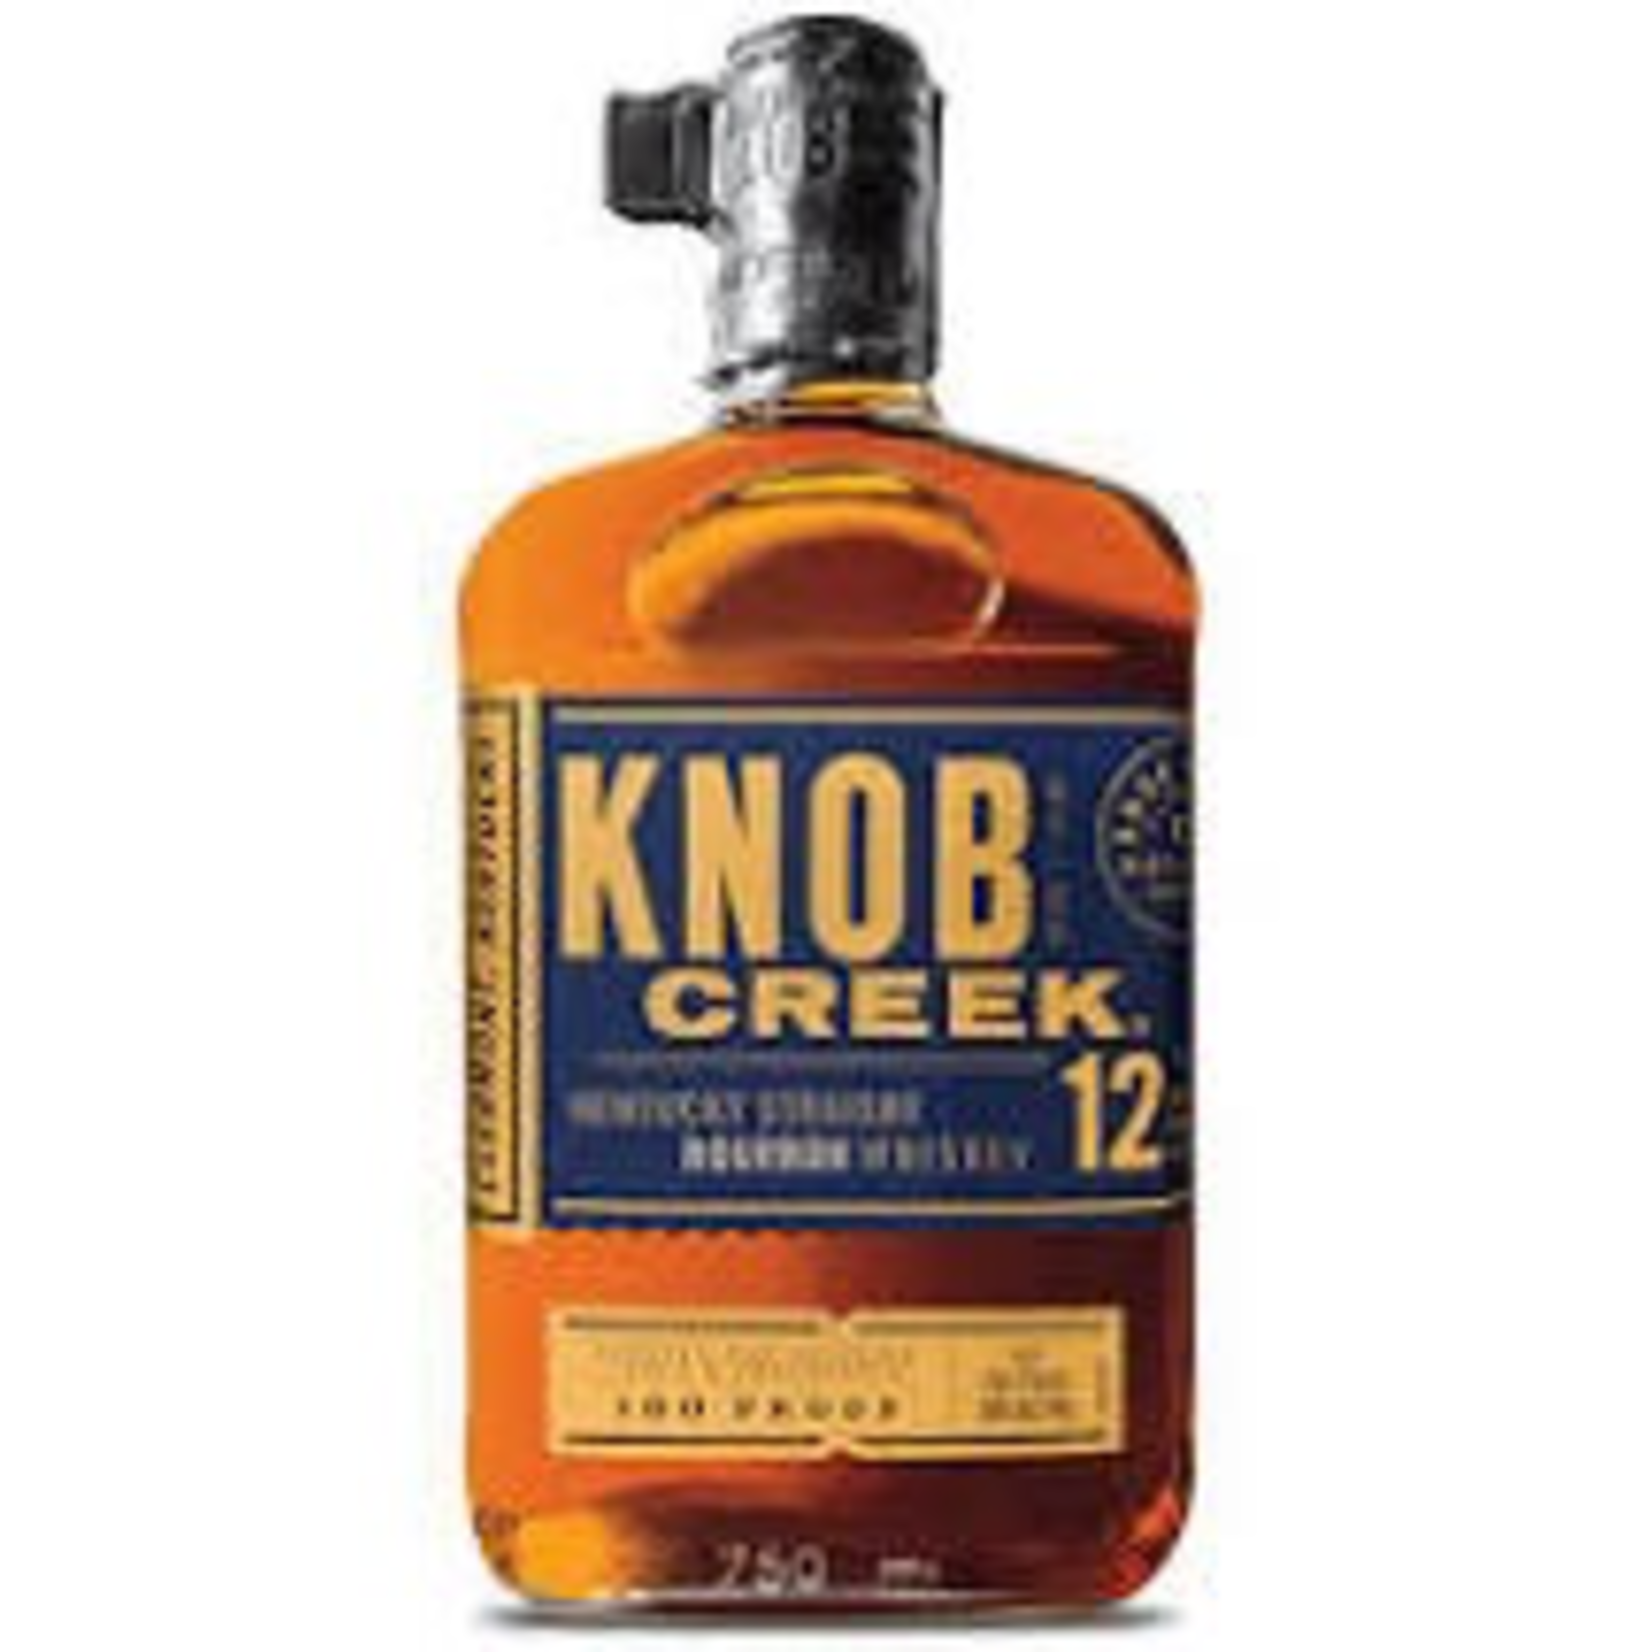 Spirits Knob Creek Kentucky Straight Bourbon Whiskey 12 Year